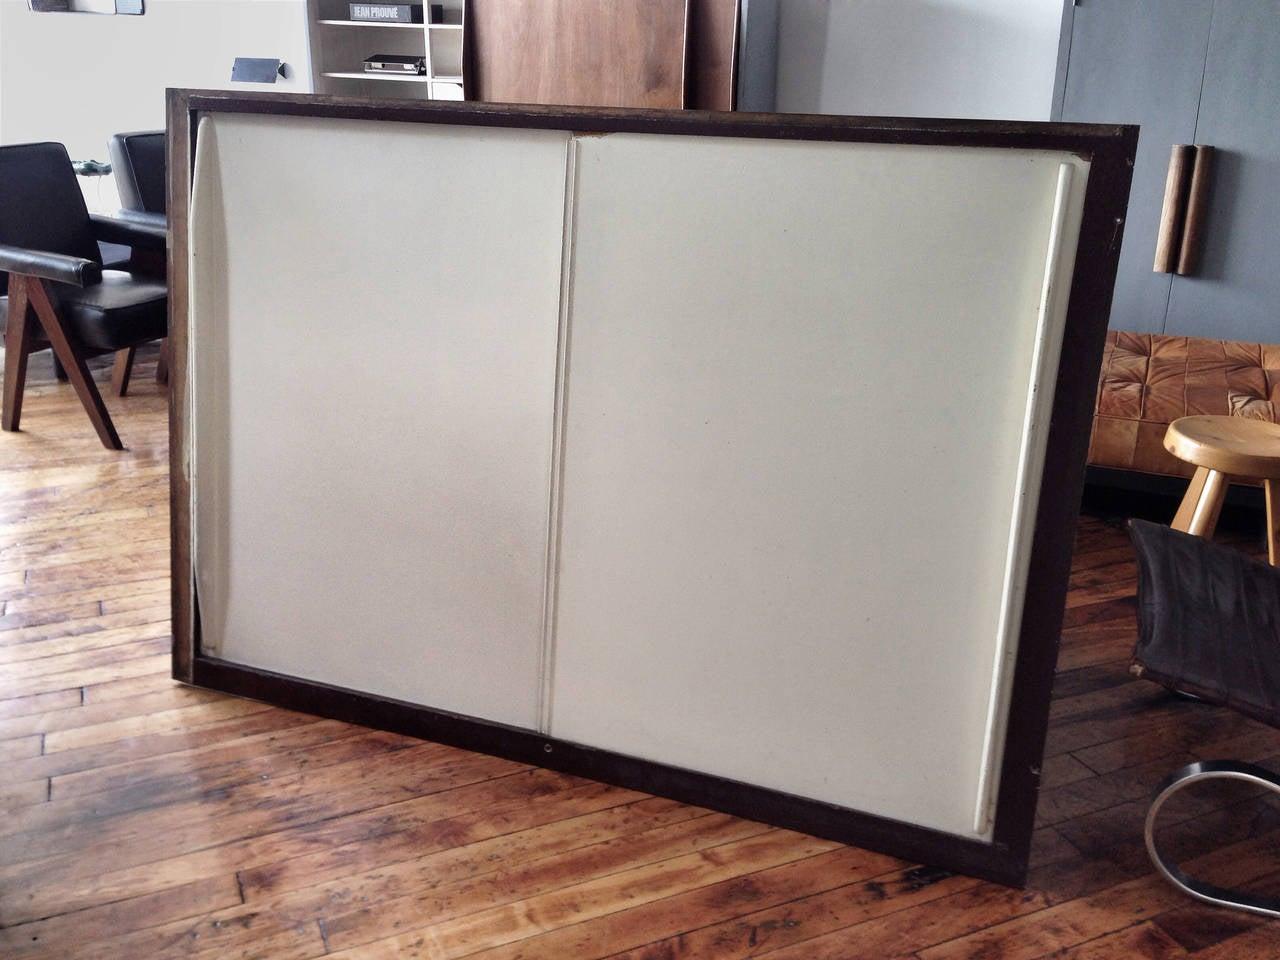 Jean Prouvé Sliding Cabinet Doors in Frames 2